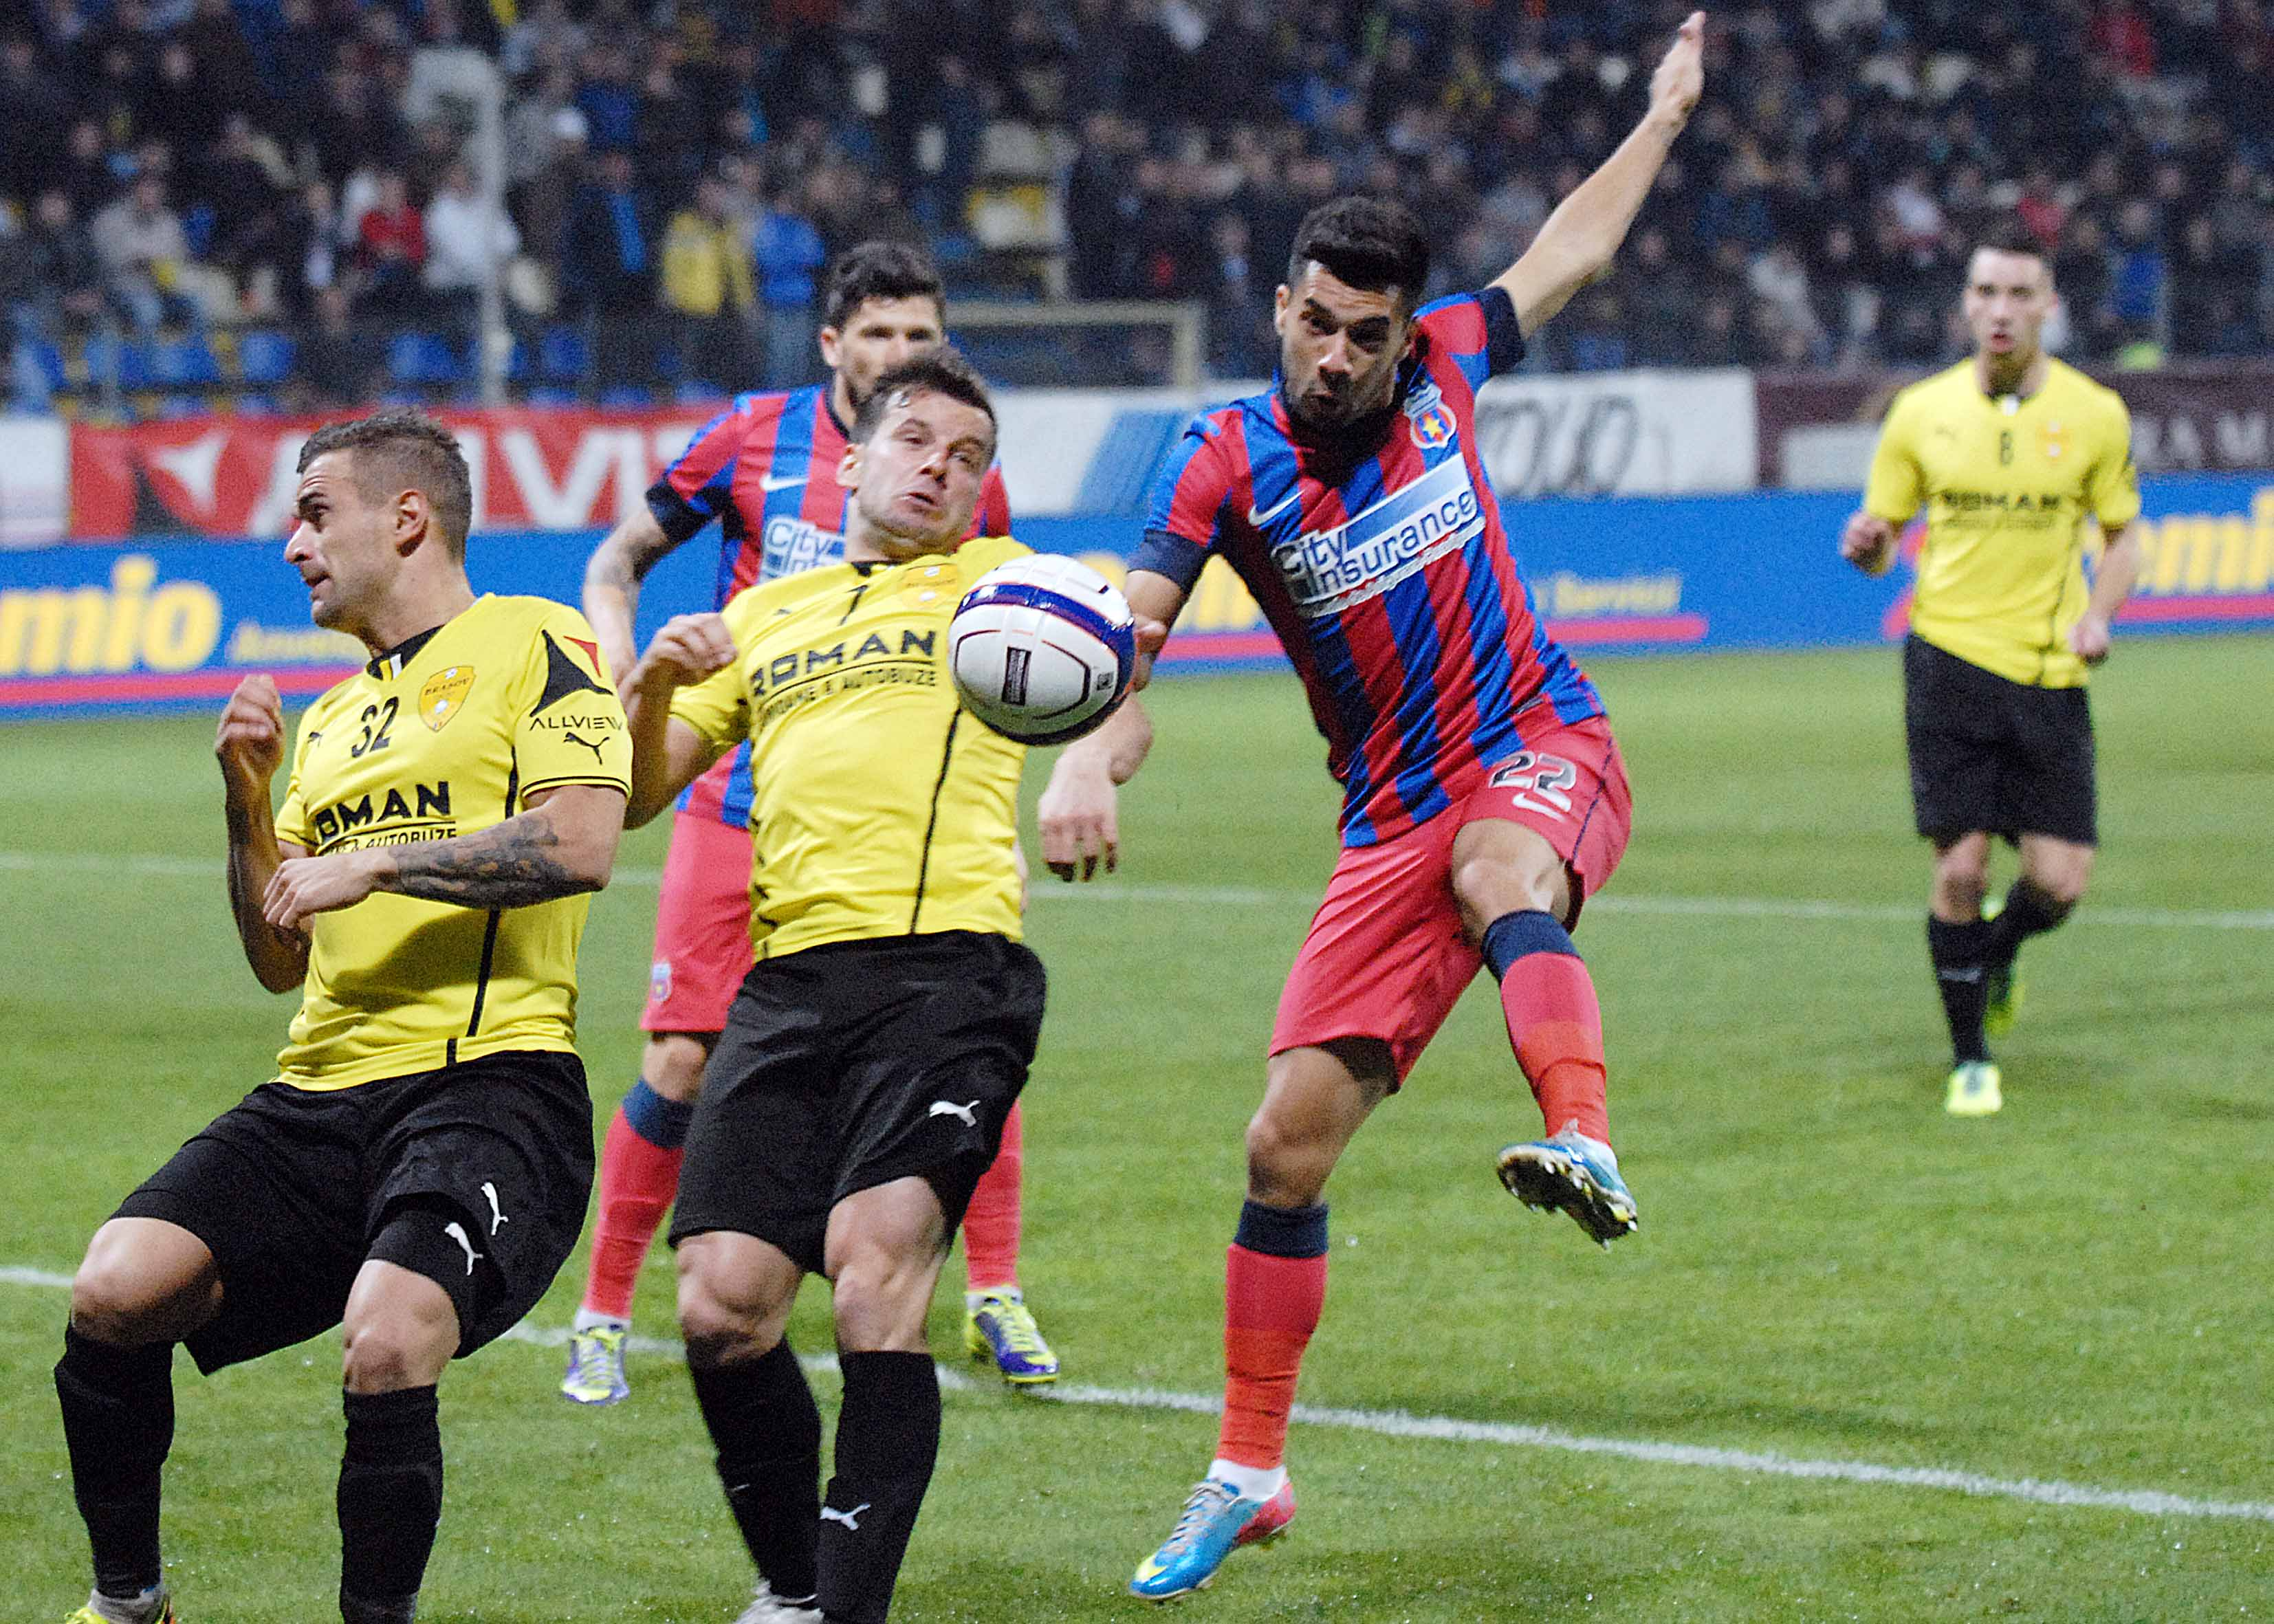 1.FOTBAL:FC BRASOV-STEAUA BUCURESTI 1-1,LIGA 1 (27.10.2013)